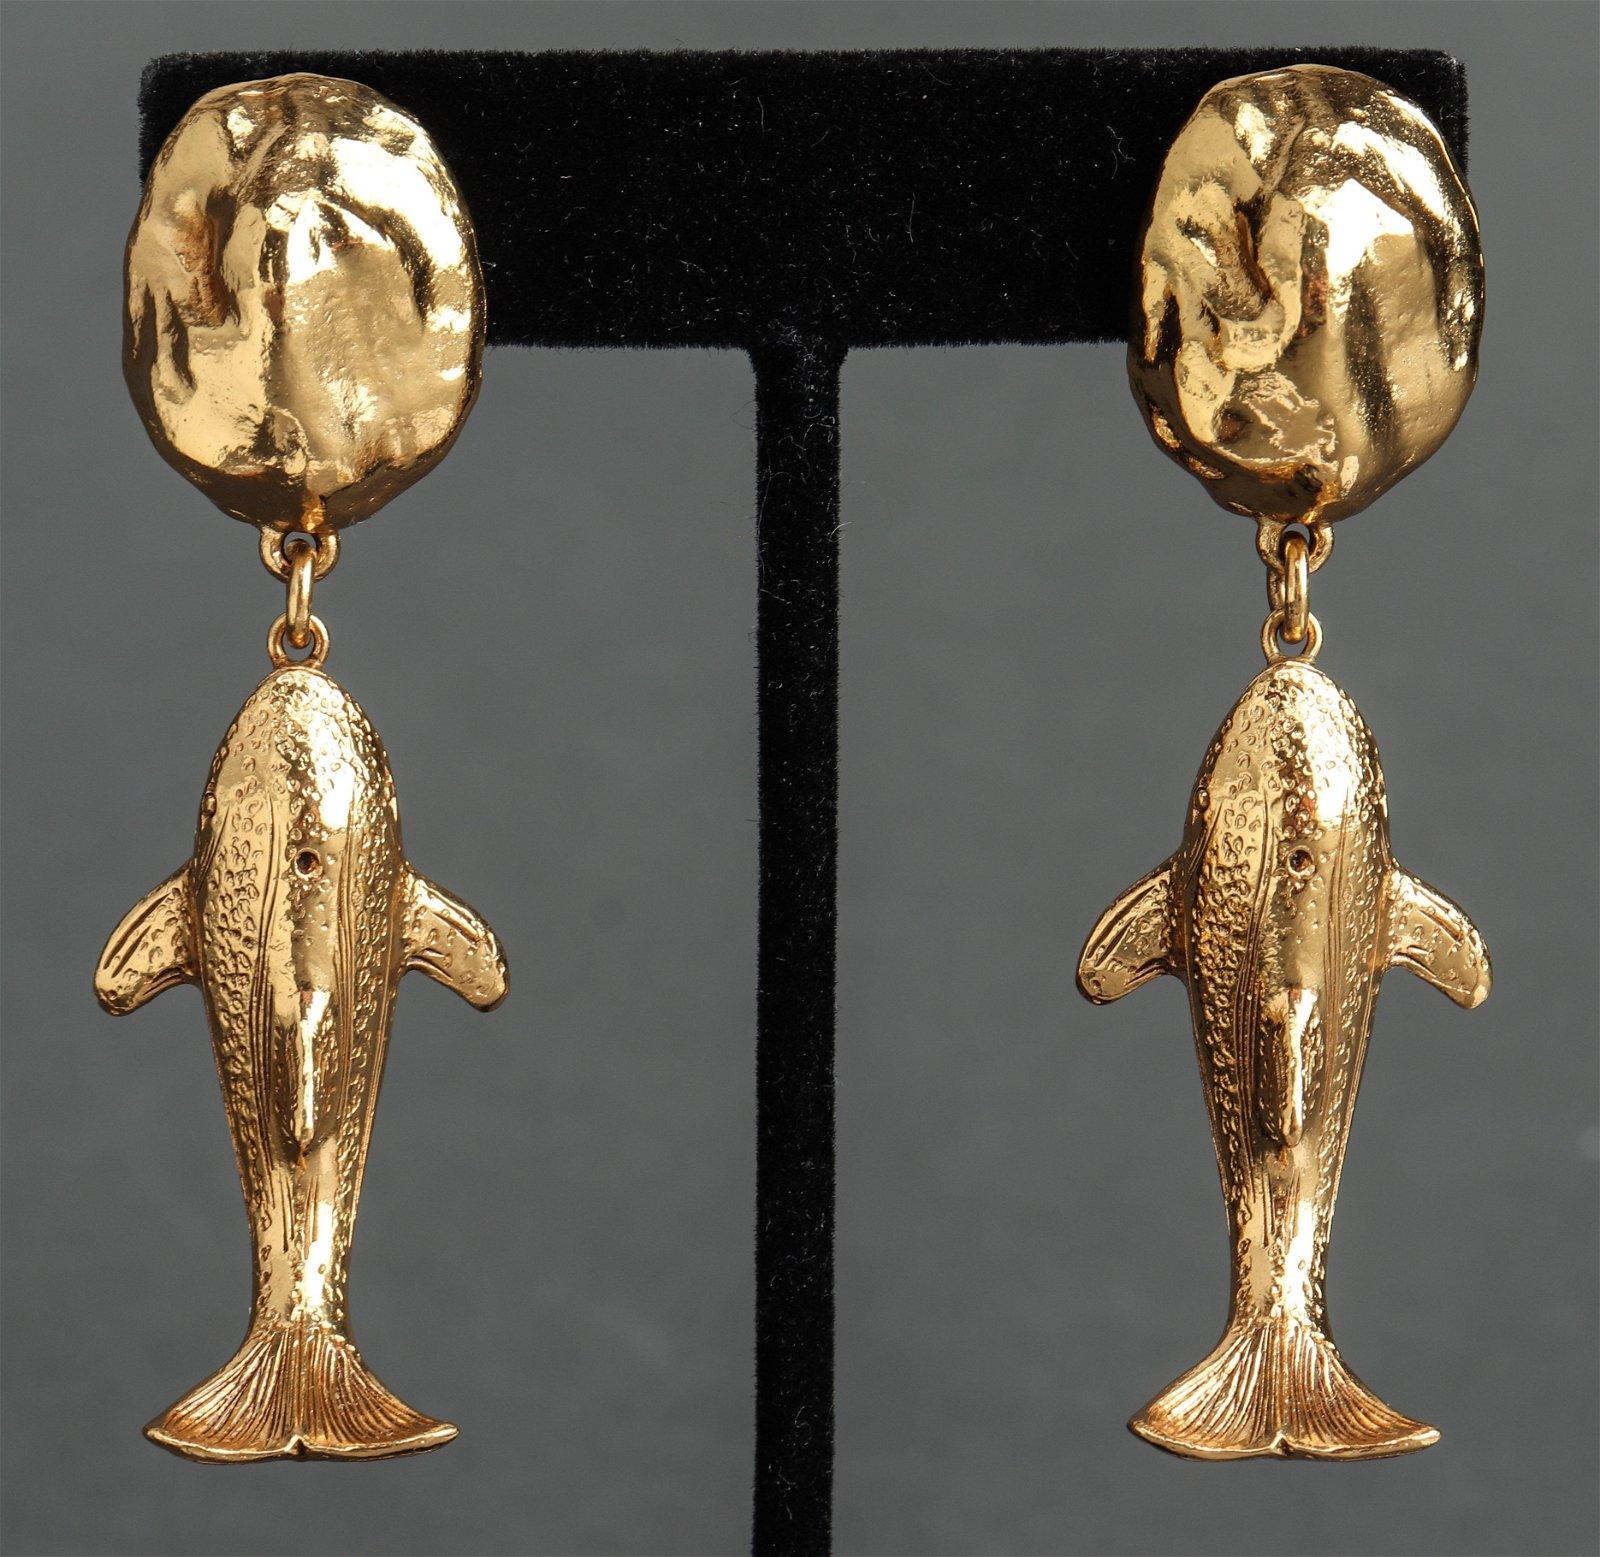 Christian Dior Runway Whale Motif Earrings